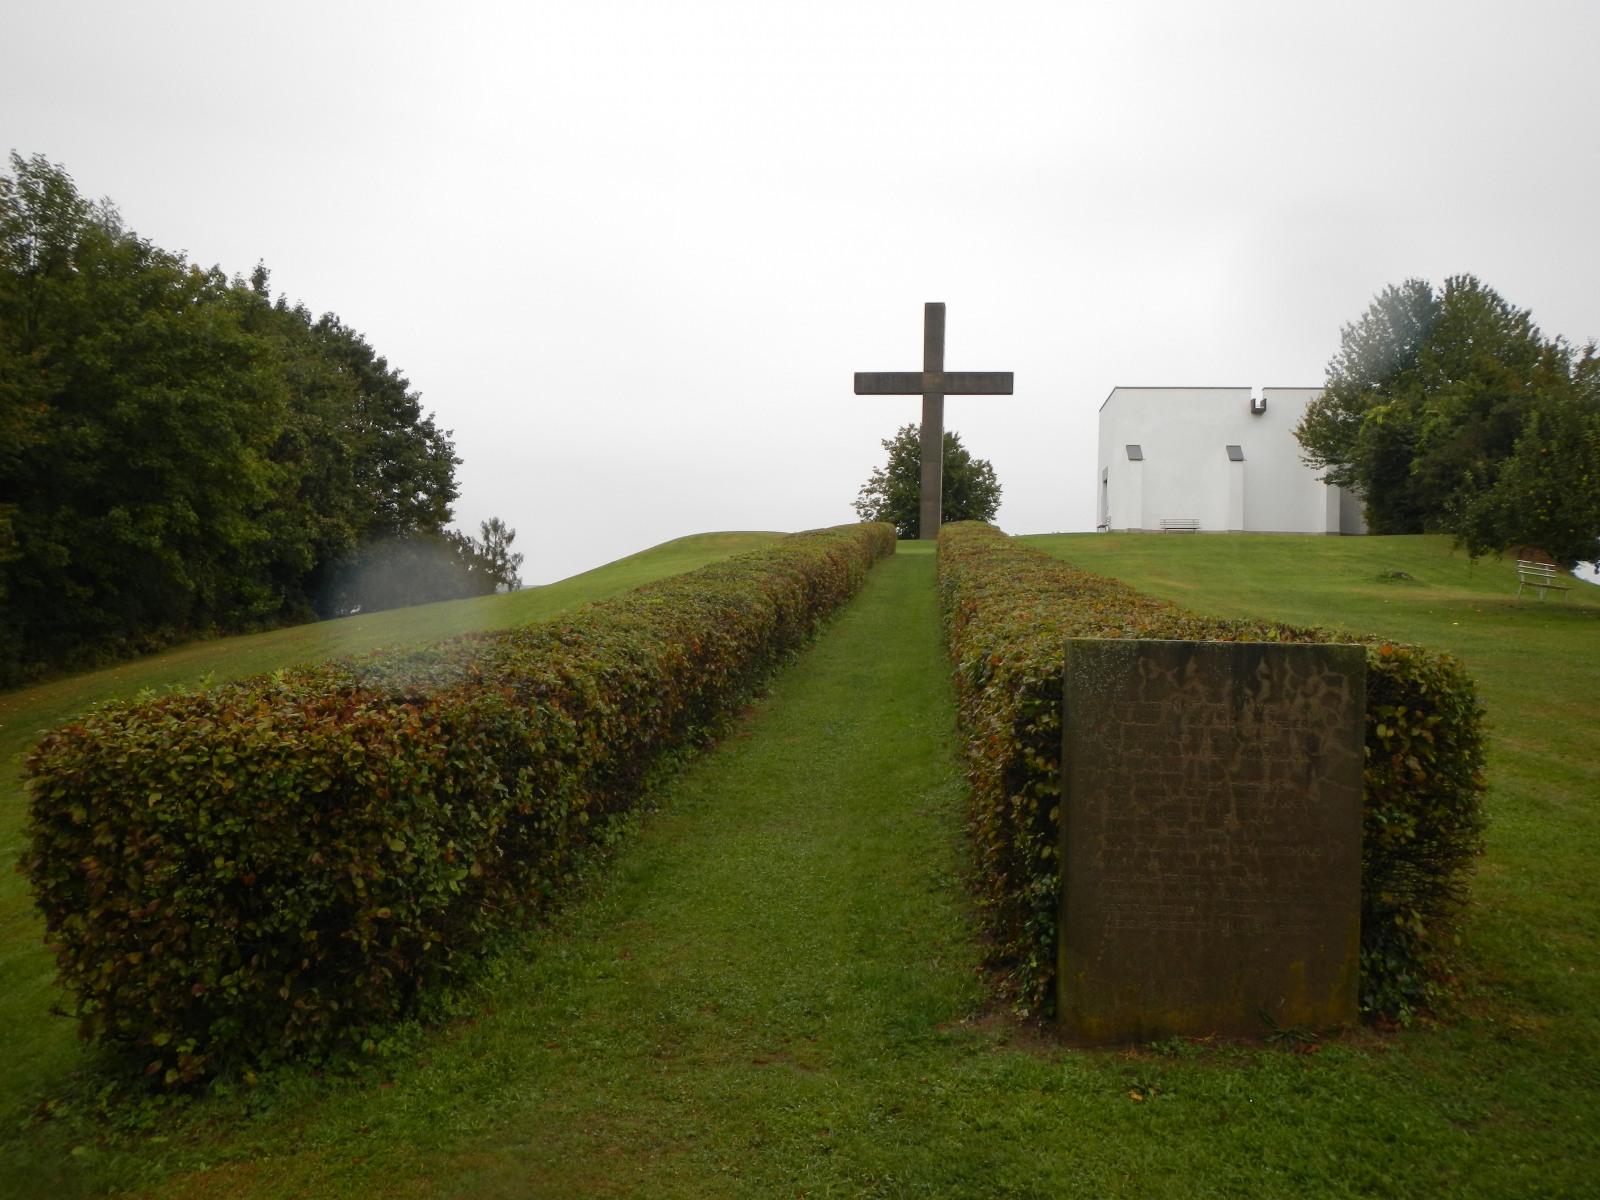 Friedensweg am Schlösslberg